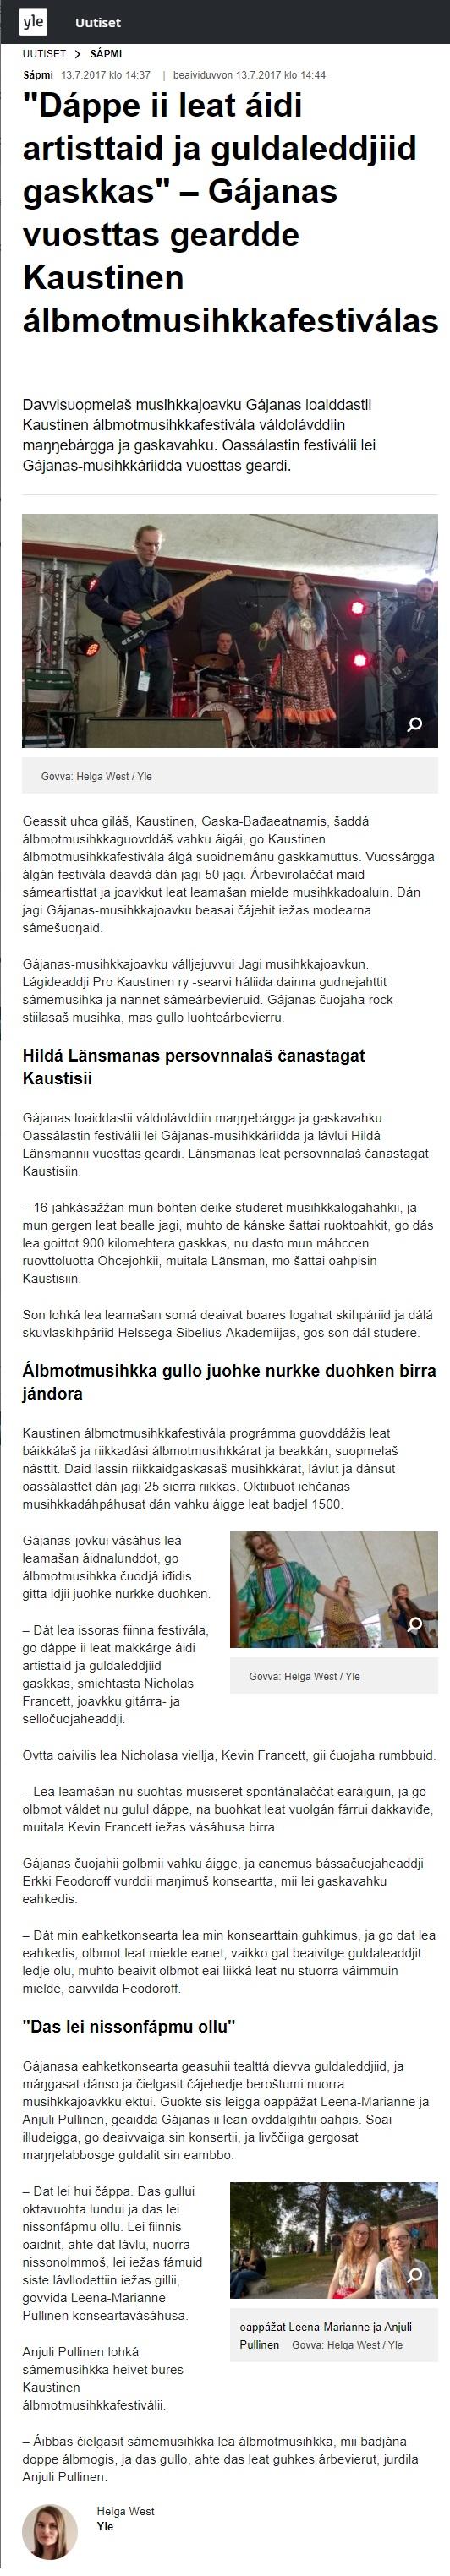 Yle Sápmi (Finland), 13.7.2017